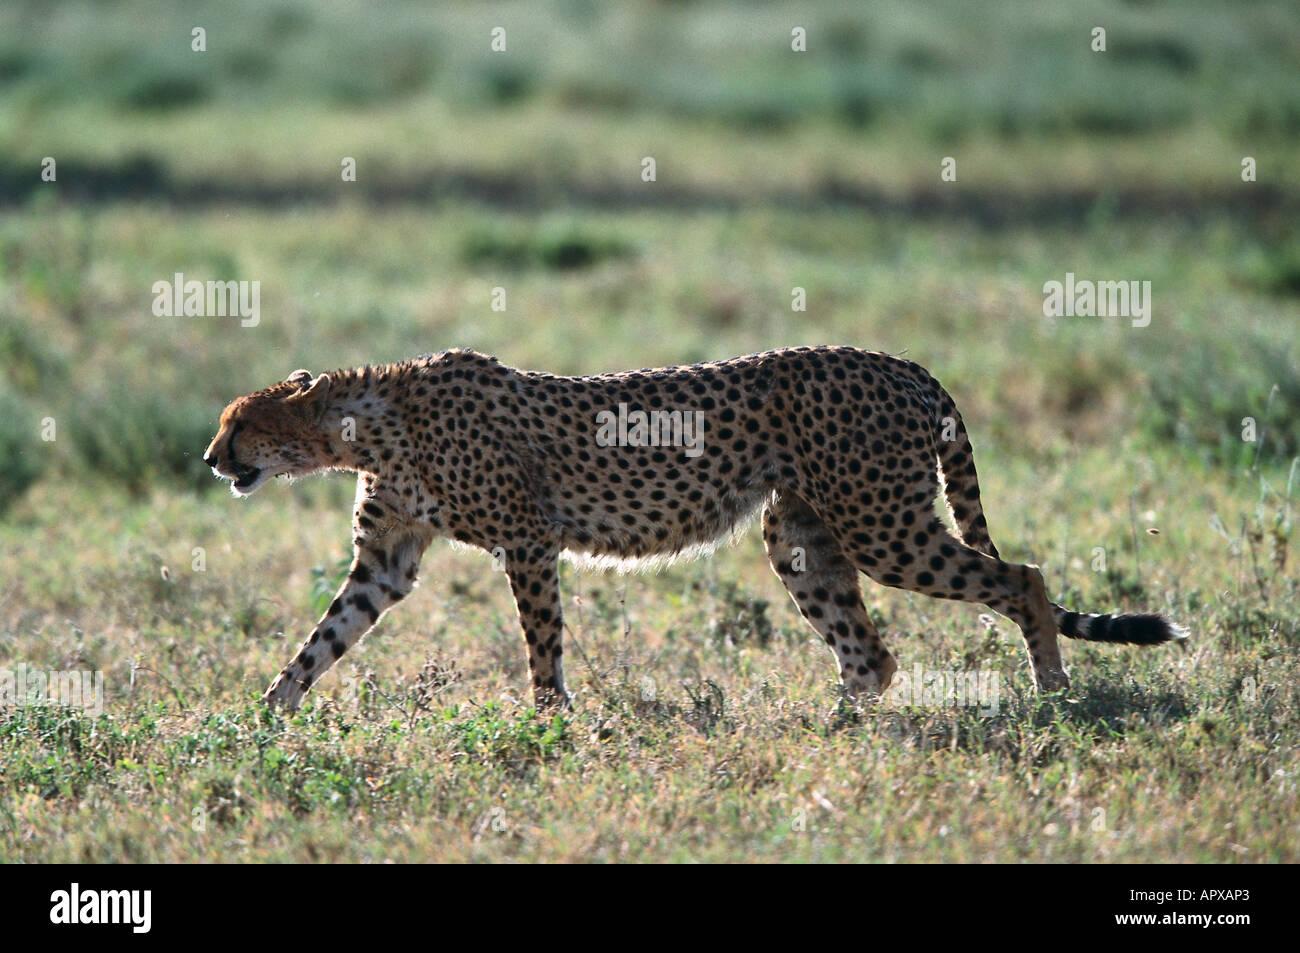 Cheetah, Serengeti NP Tansania - Stock Image